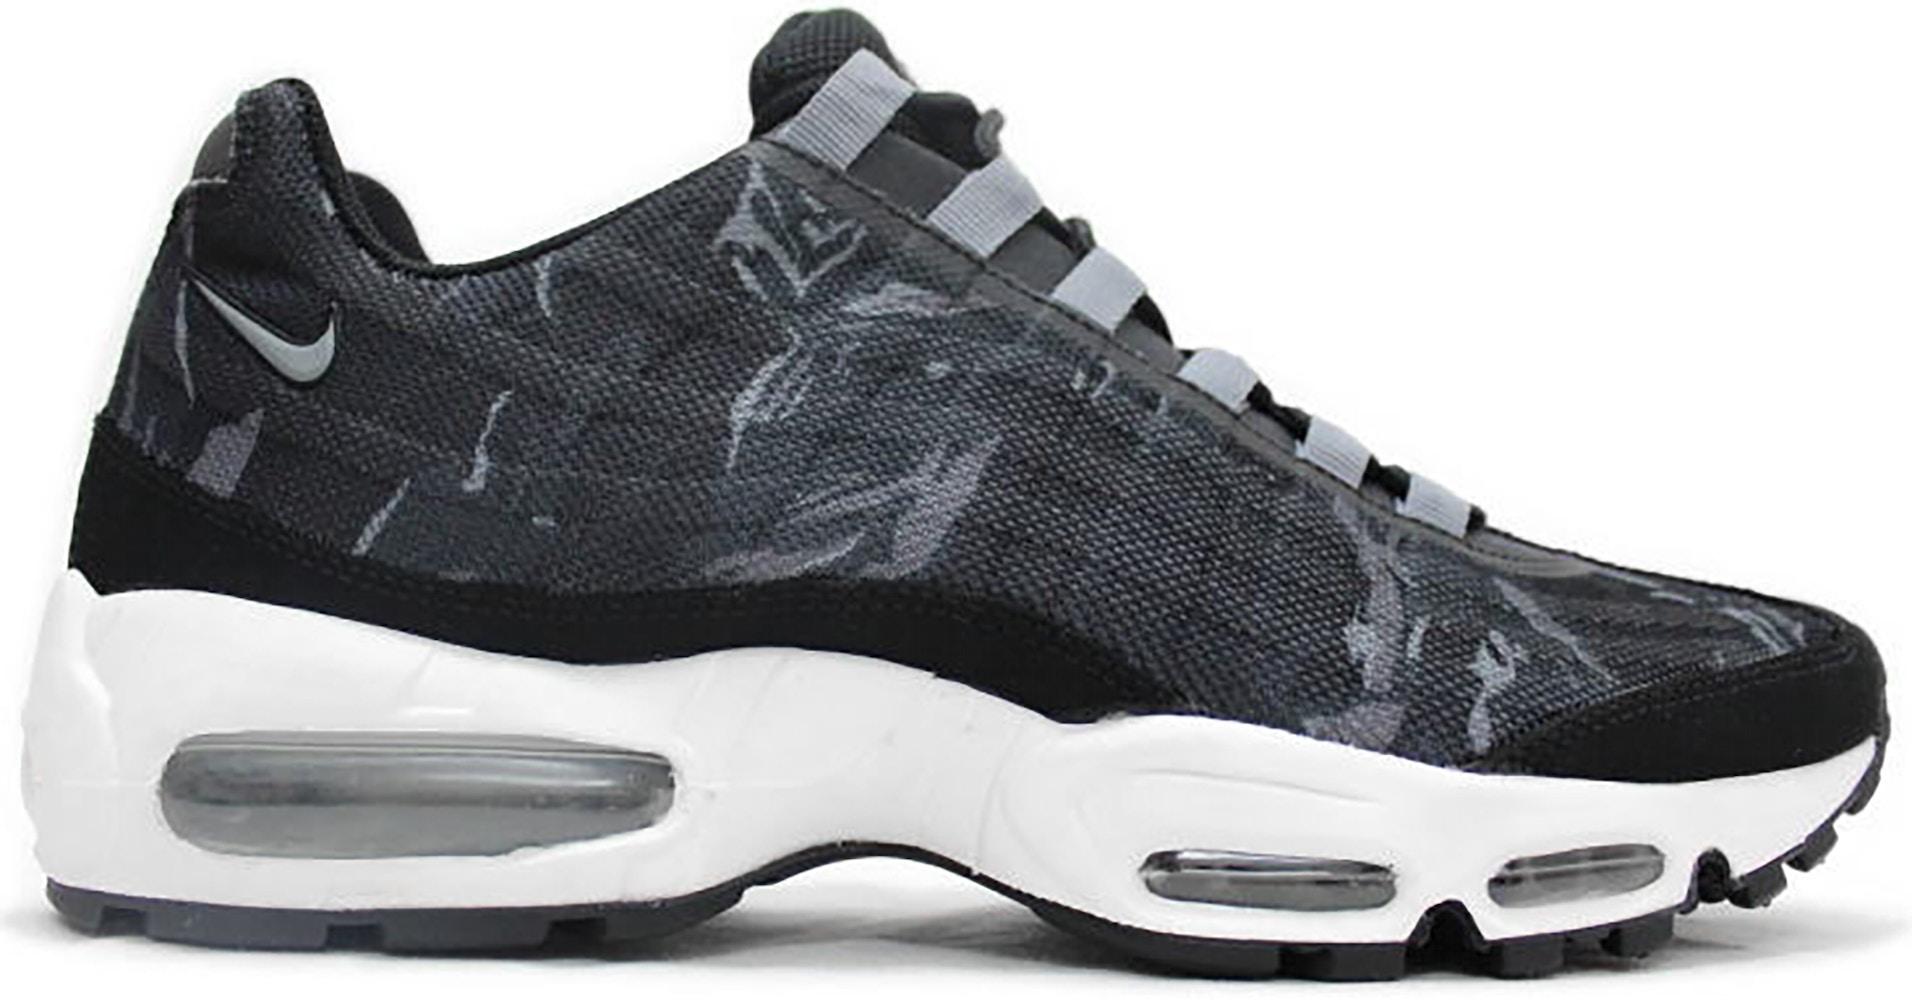 Nike Air Max 95 Tape Camo Black